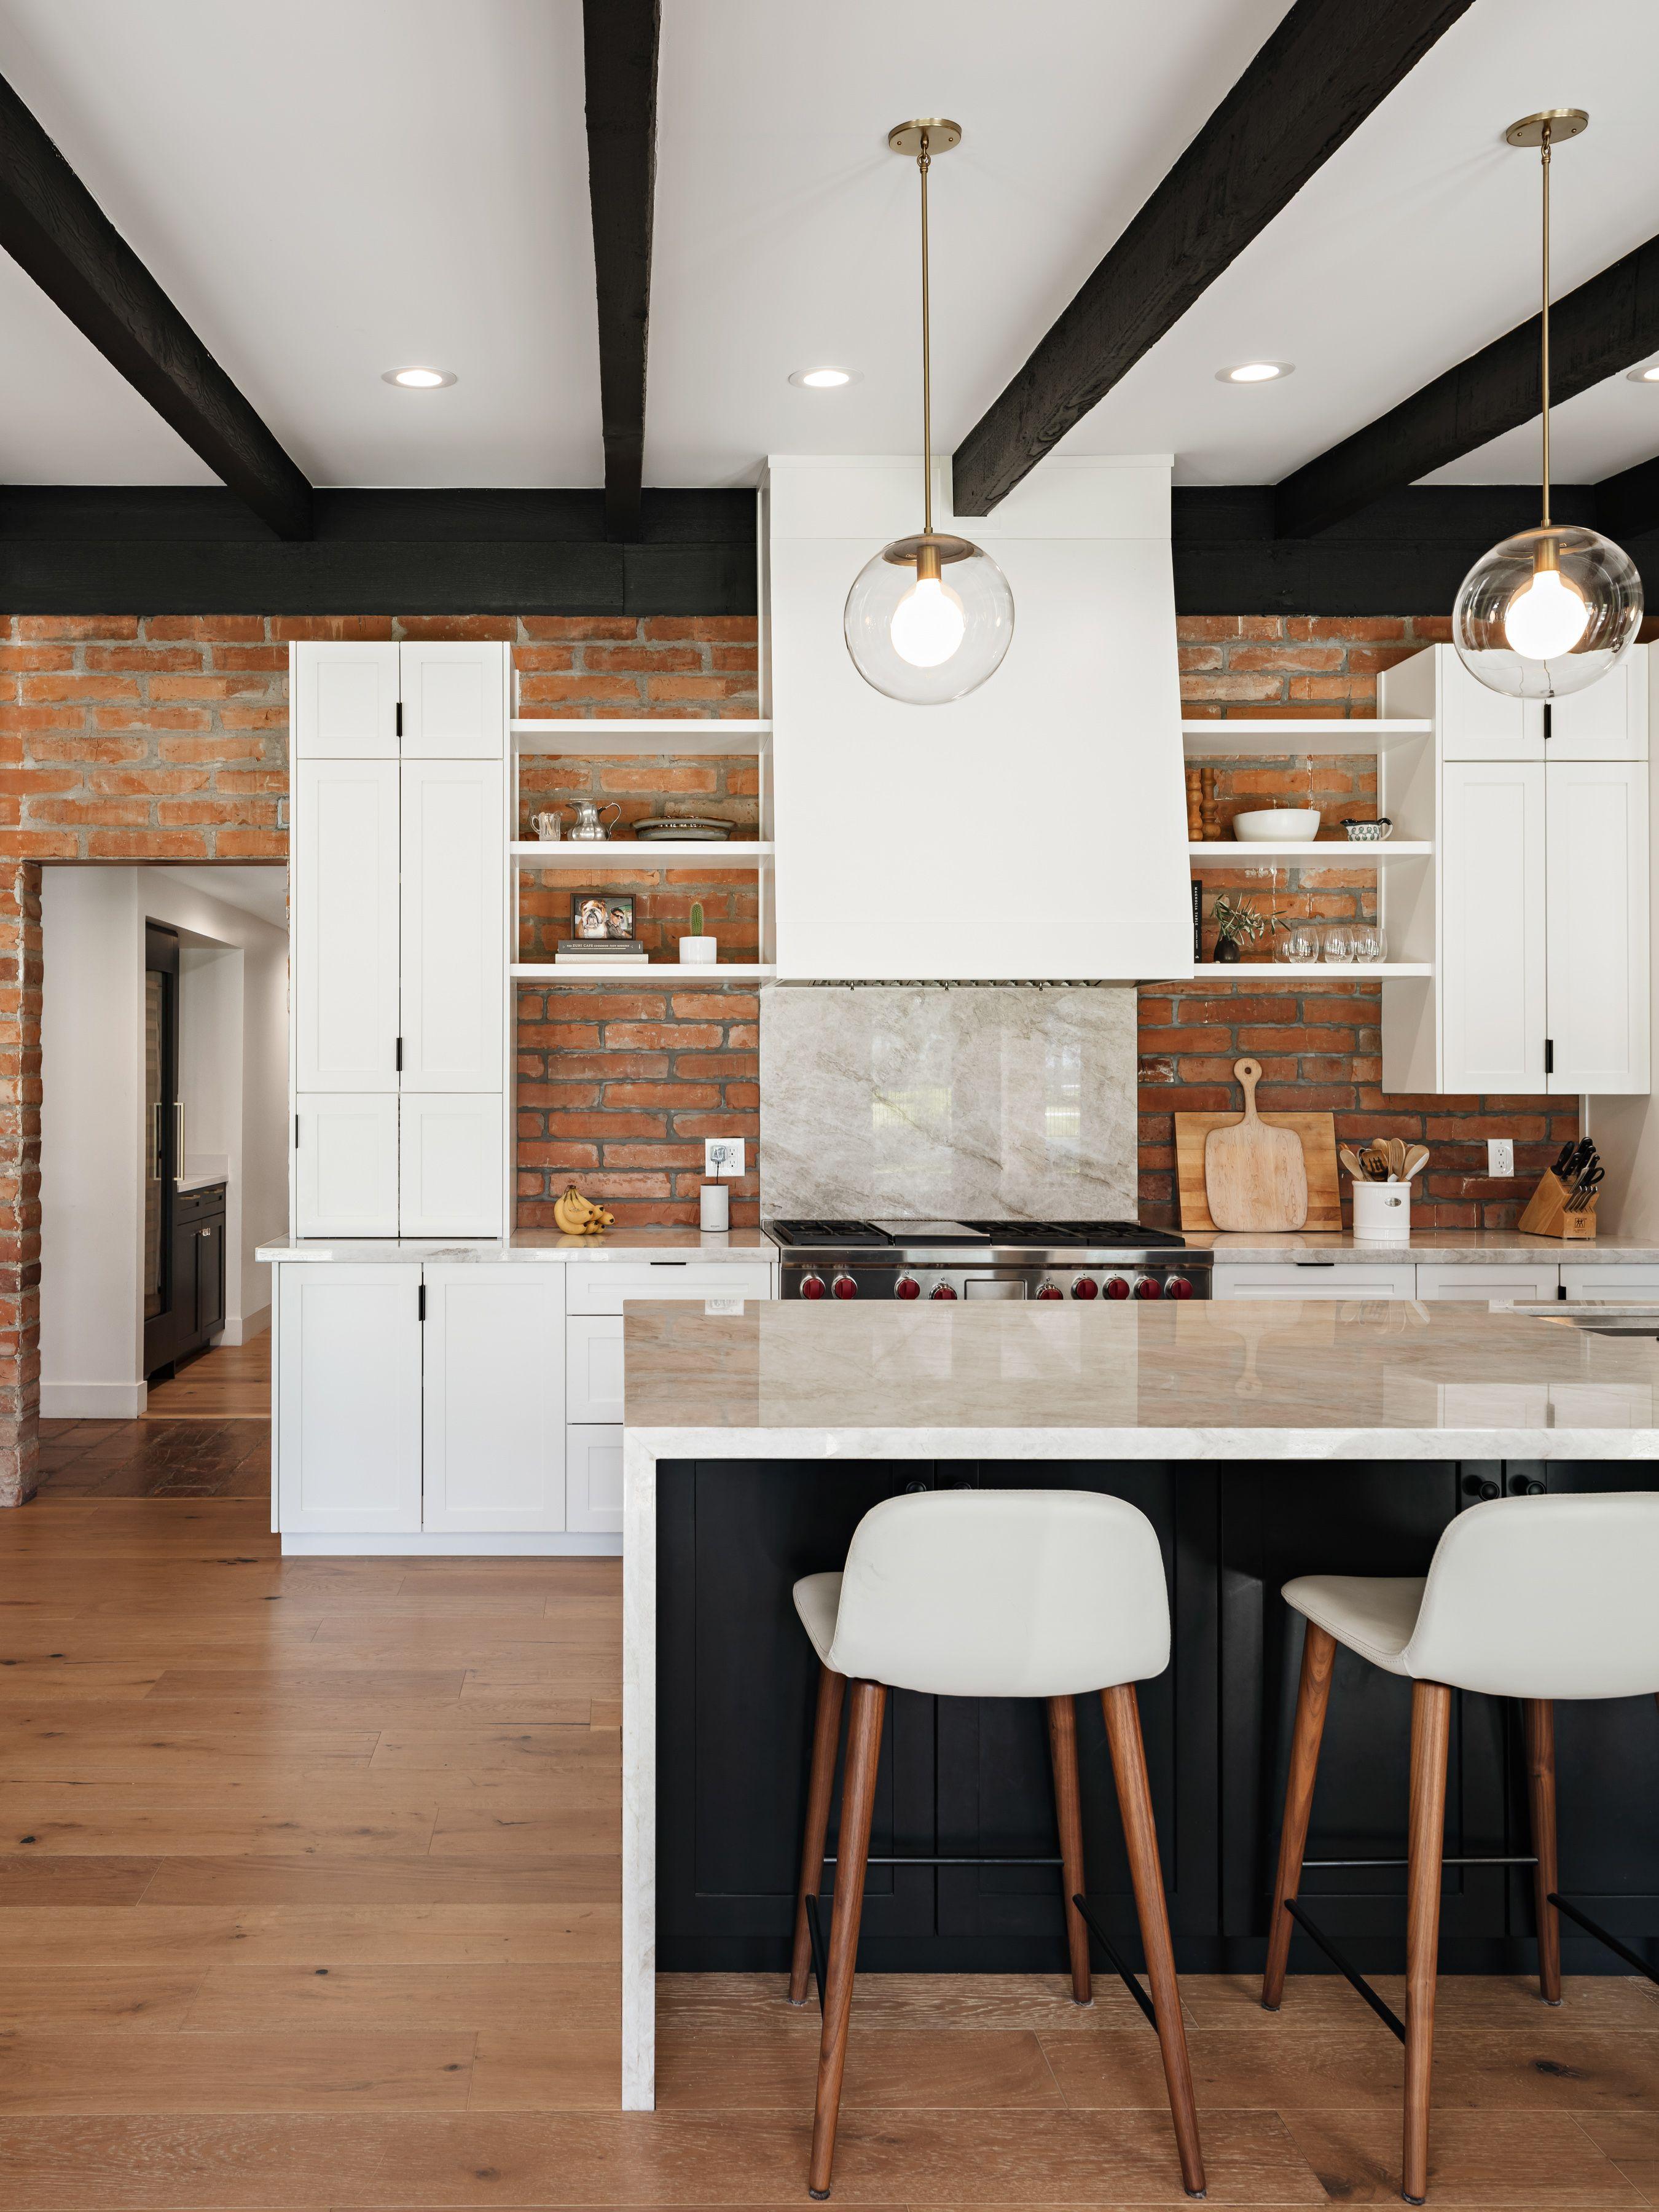 Pin By Marilia Pecorari On Lp Kitchen Interior Modern Kitchen Trending Decor